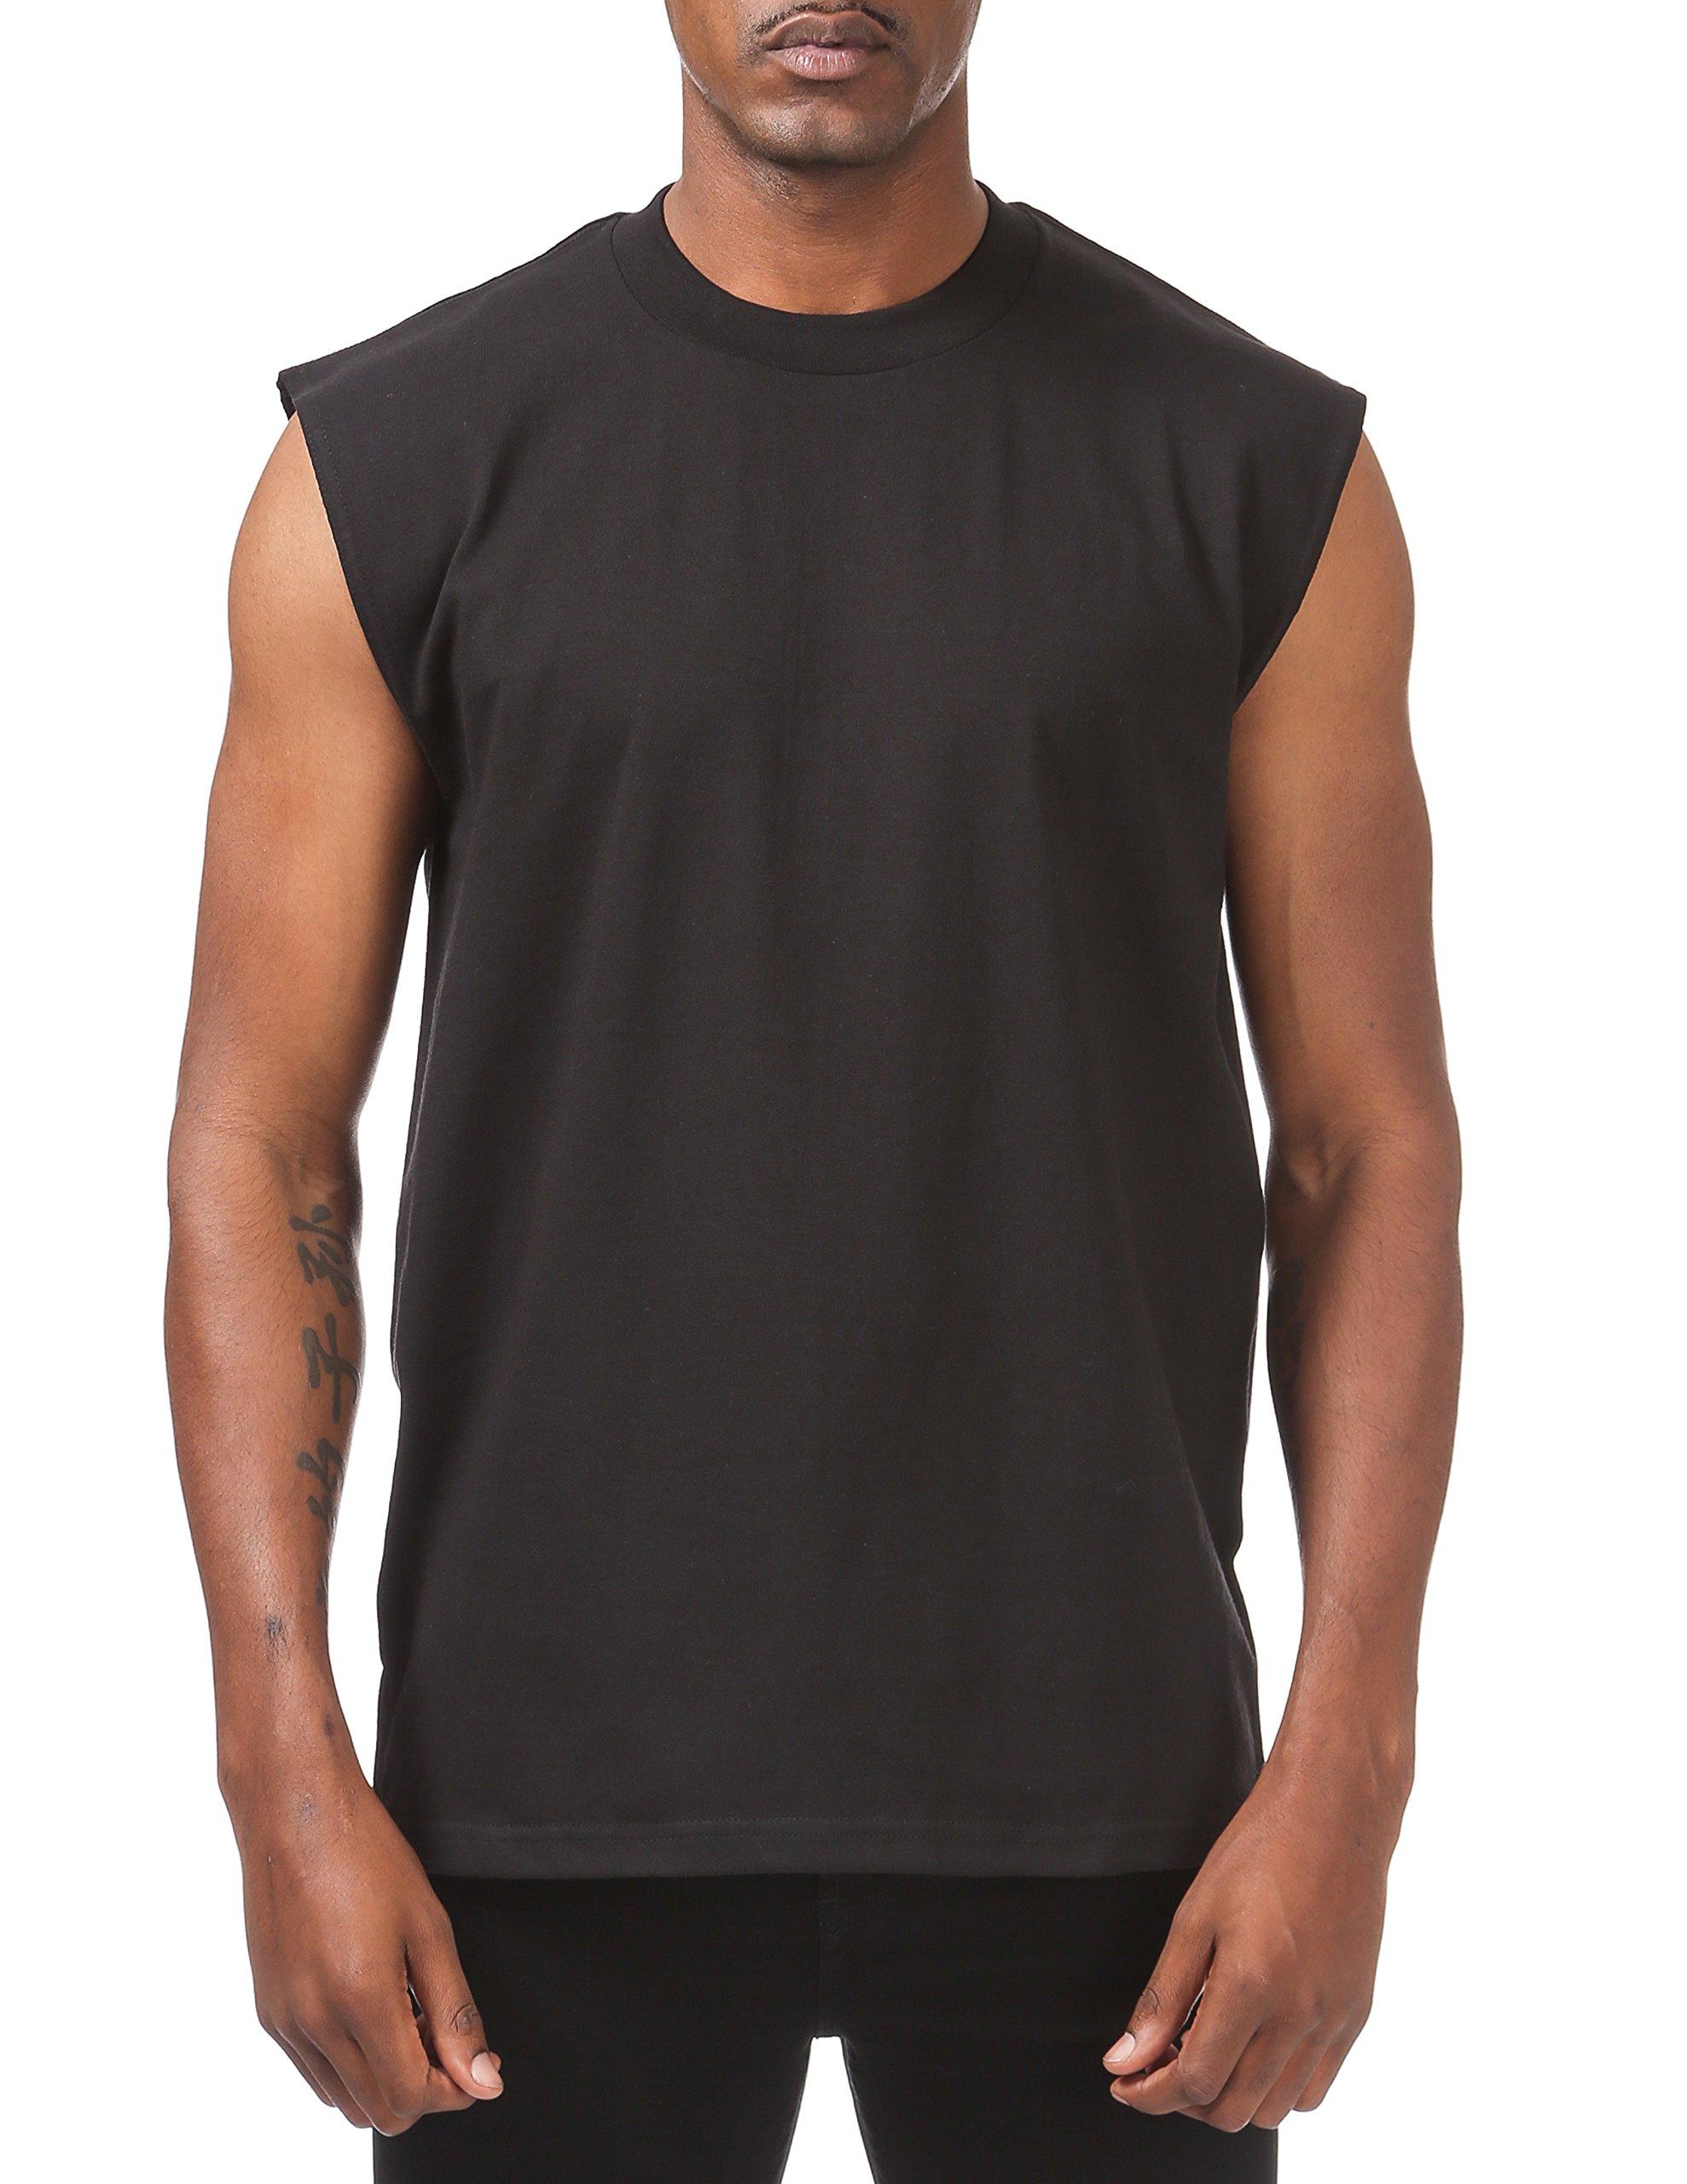 Pro Club Men's Heavyweight Sleeveless Muscle T-Shirt, X-Large, Black